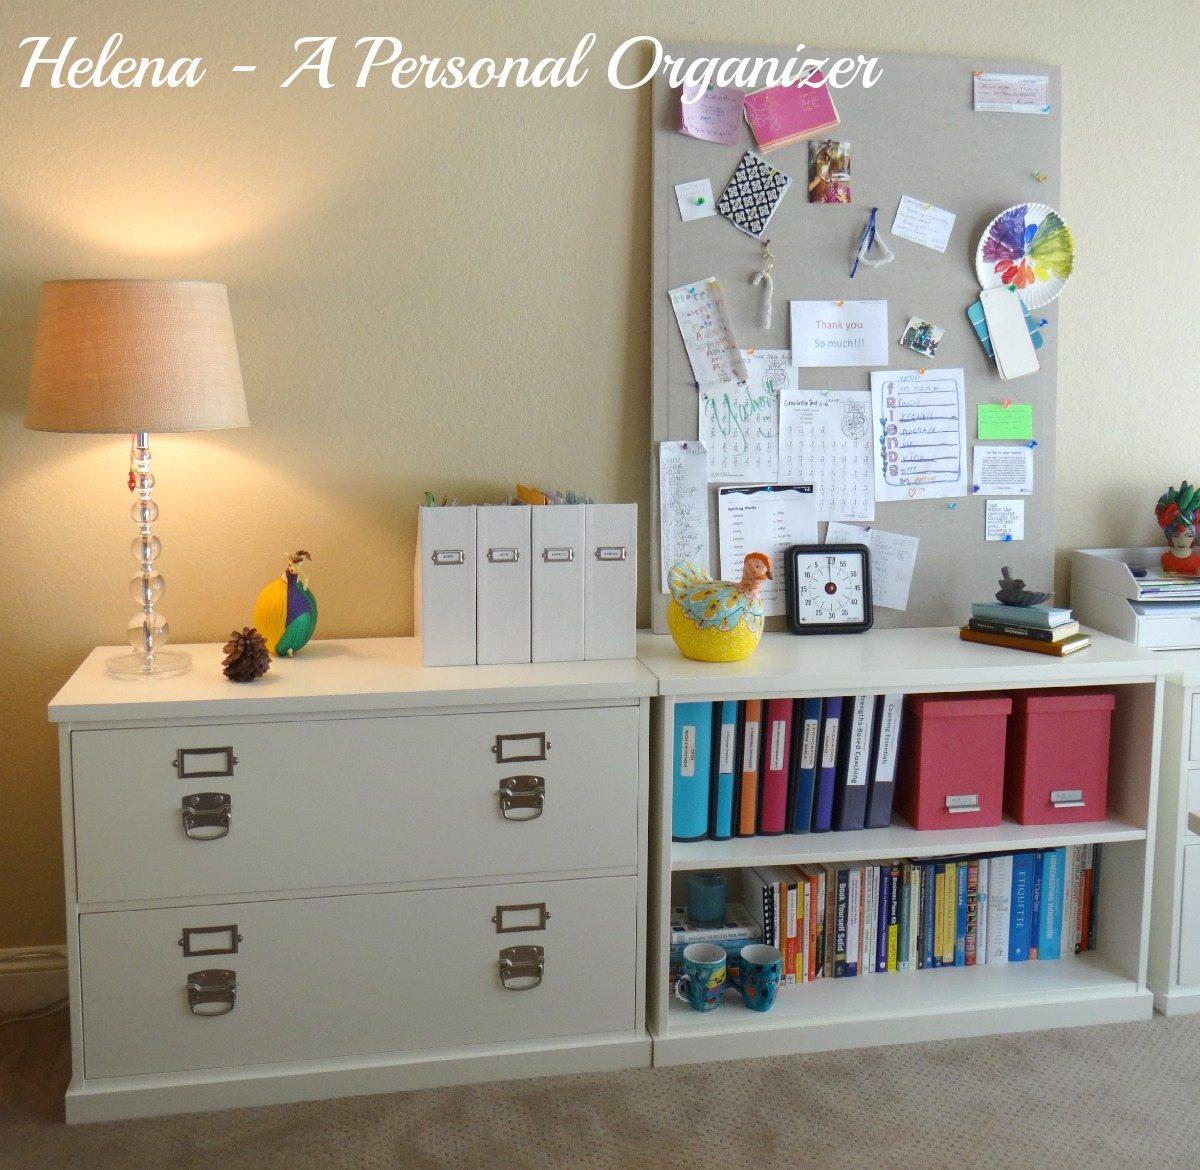 home office organizer ha home office organization ideas home office ideas home home office home office organizing ideas